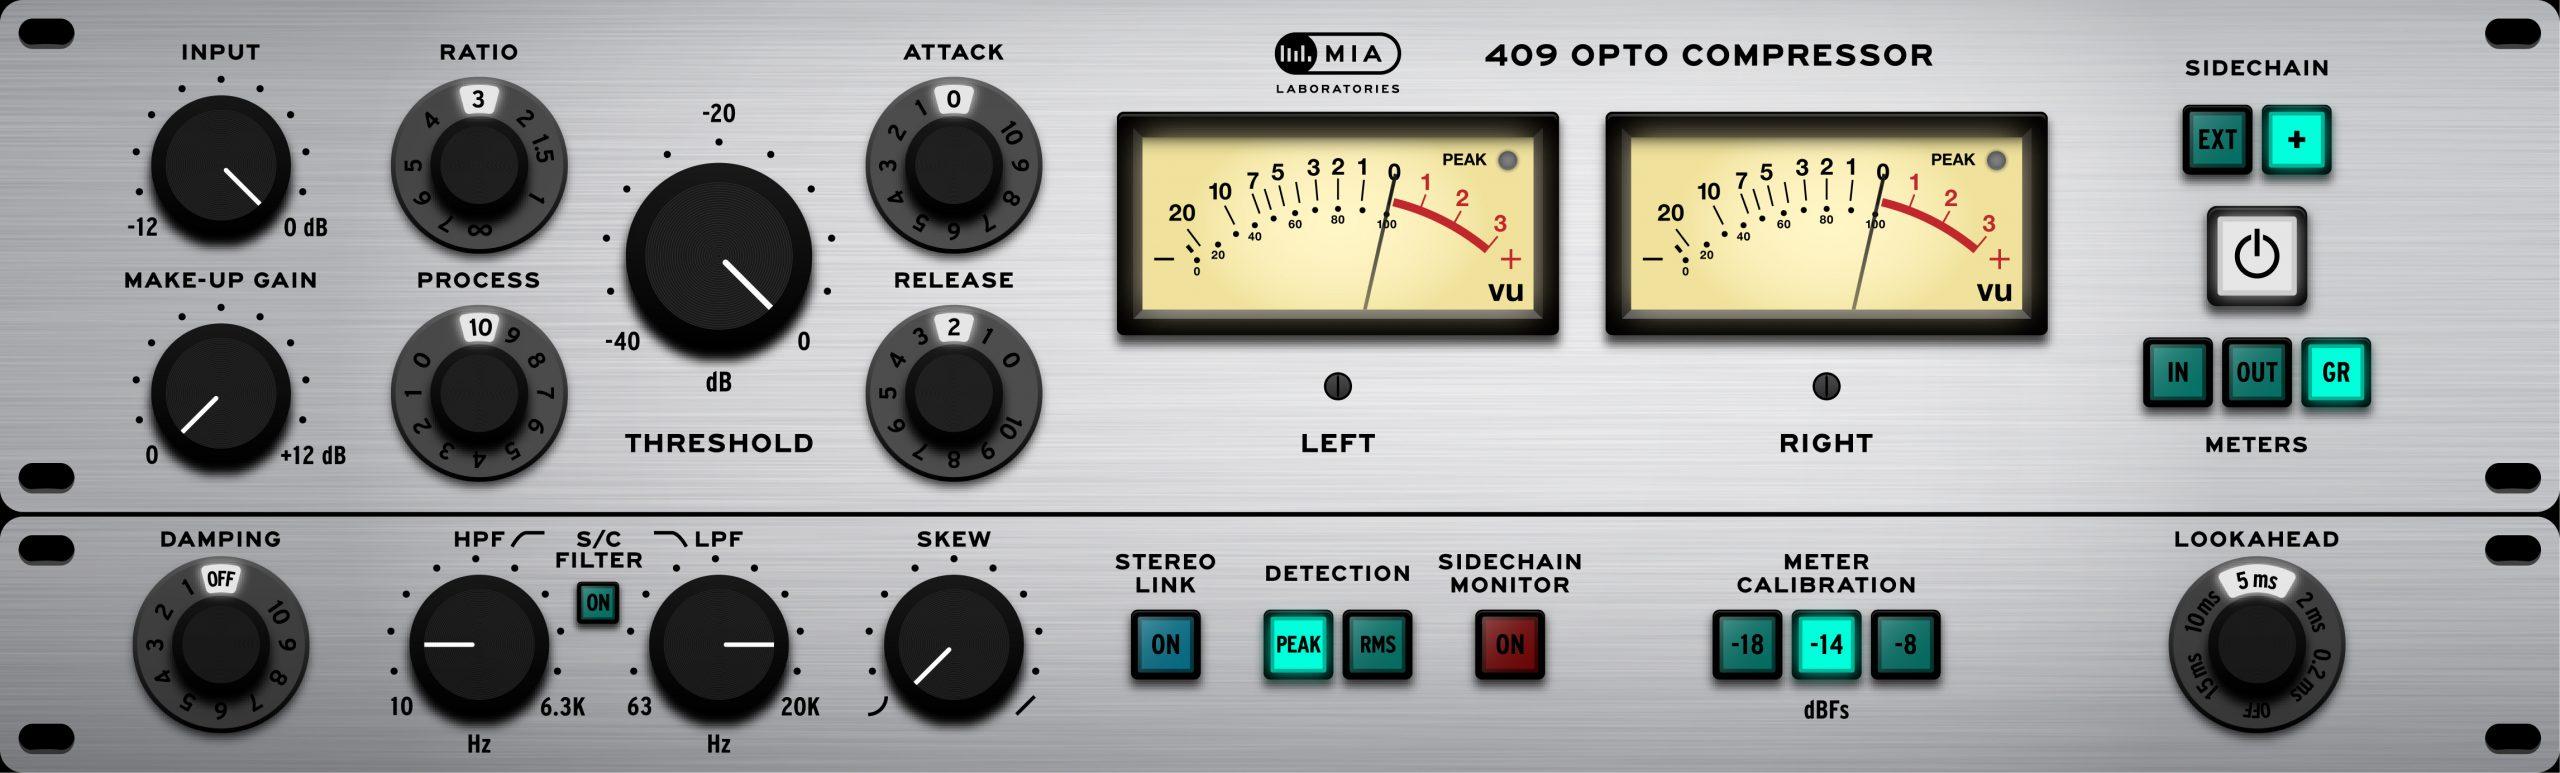 409 Opto Compressor